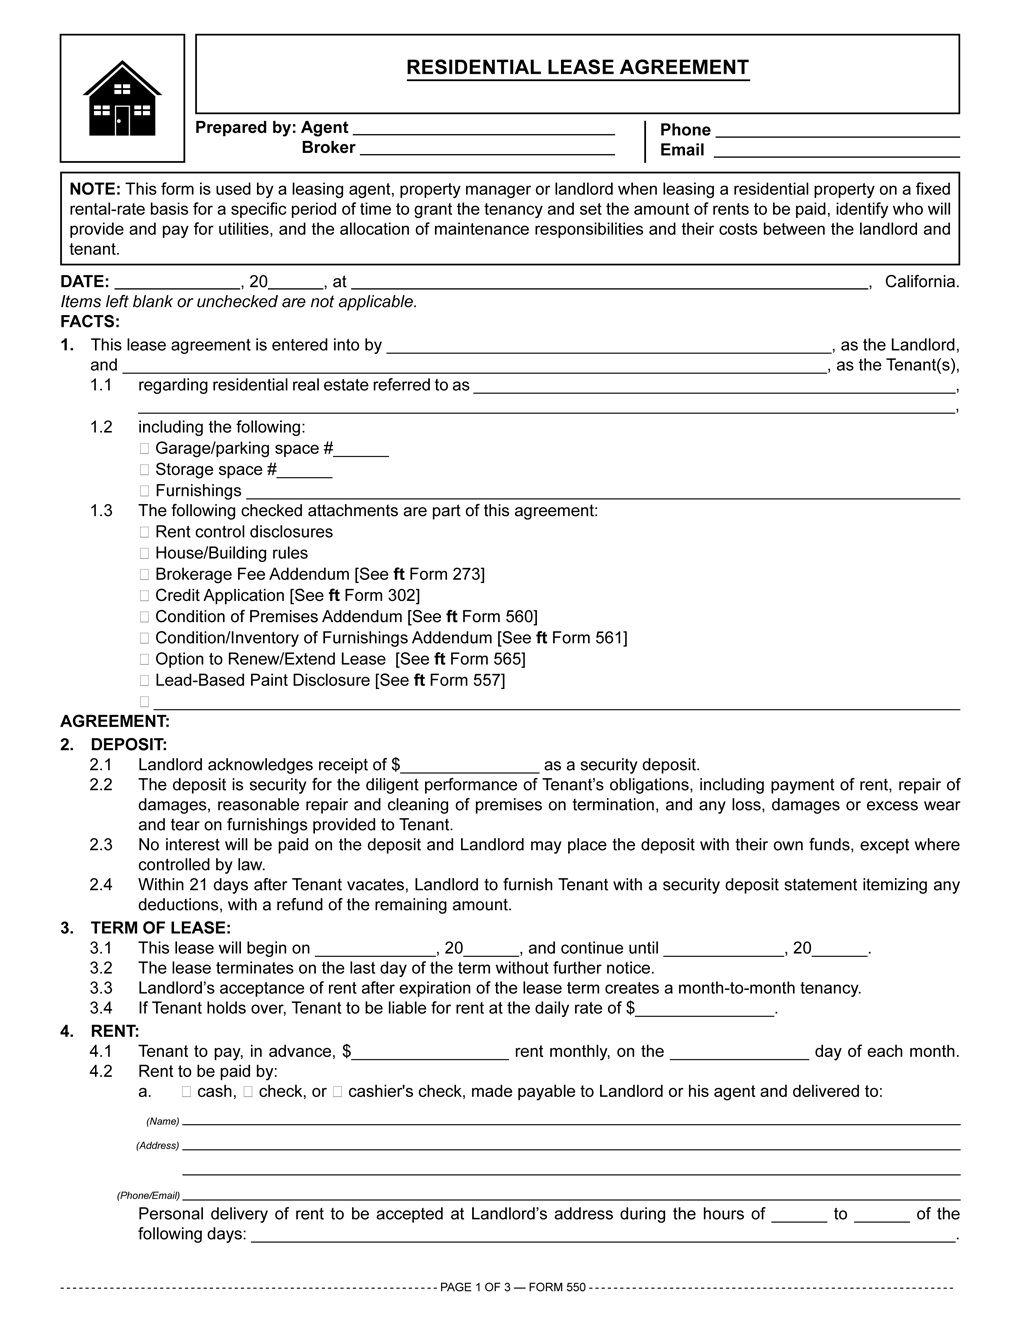 002 Fantastic Residential Lease Agreement Template Idea  Tenancy Form Alberta CaliforniaFull